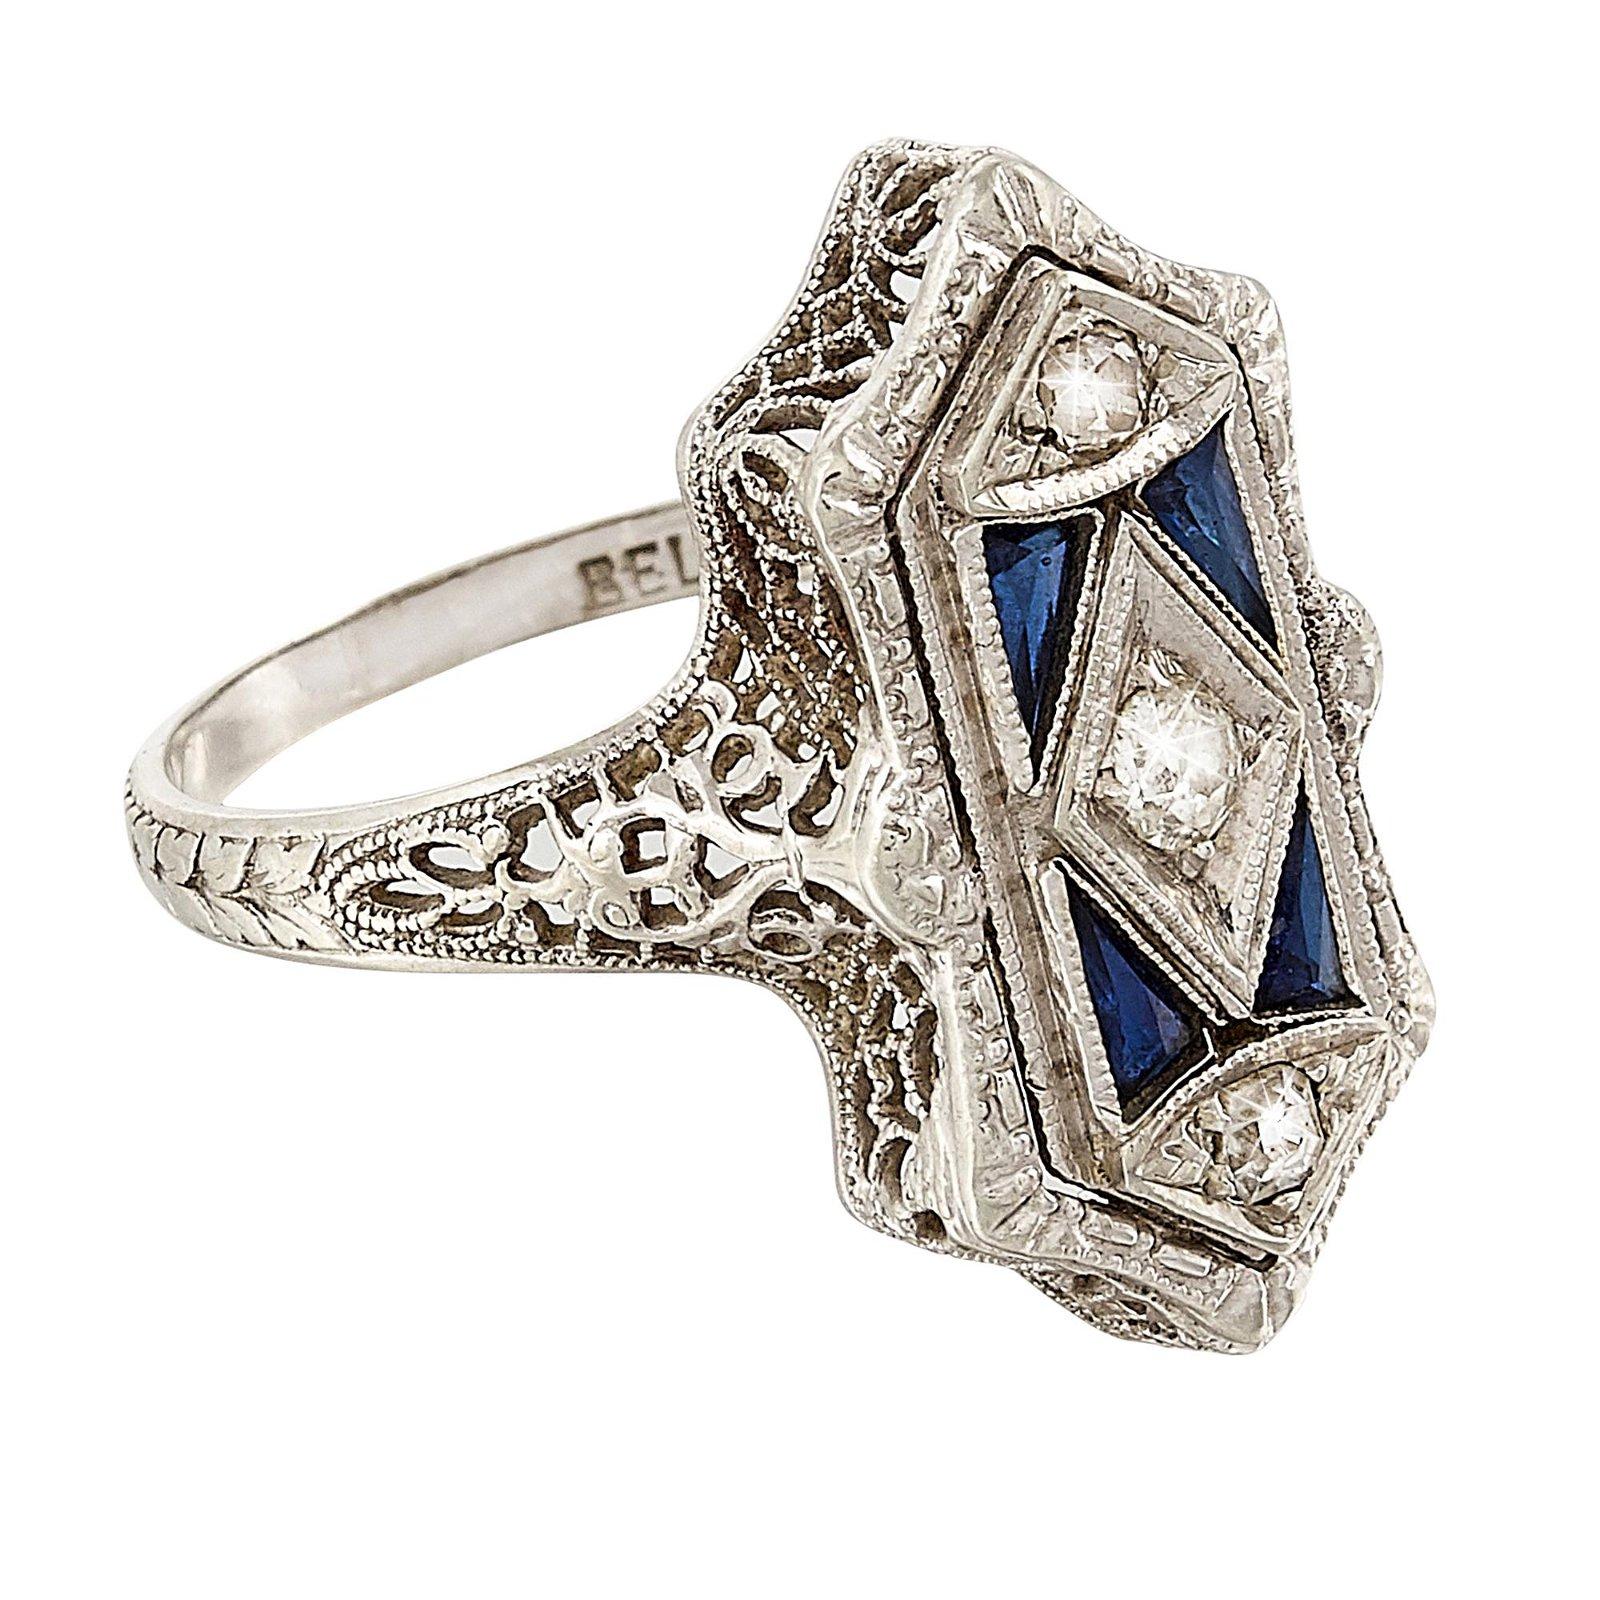 Belais Art Deco diamond, synthetic sapphire ring